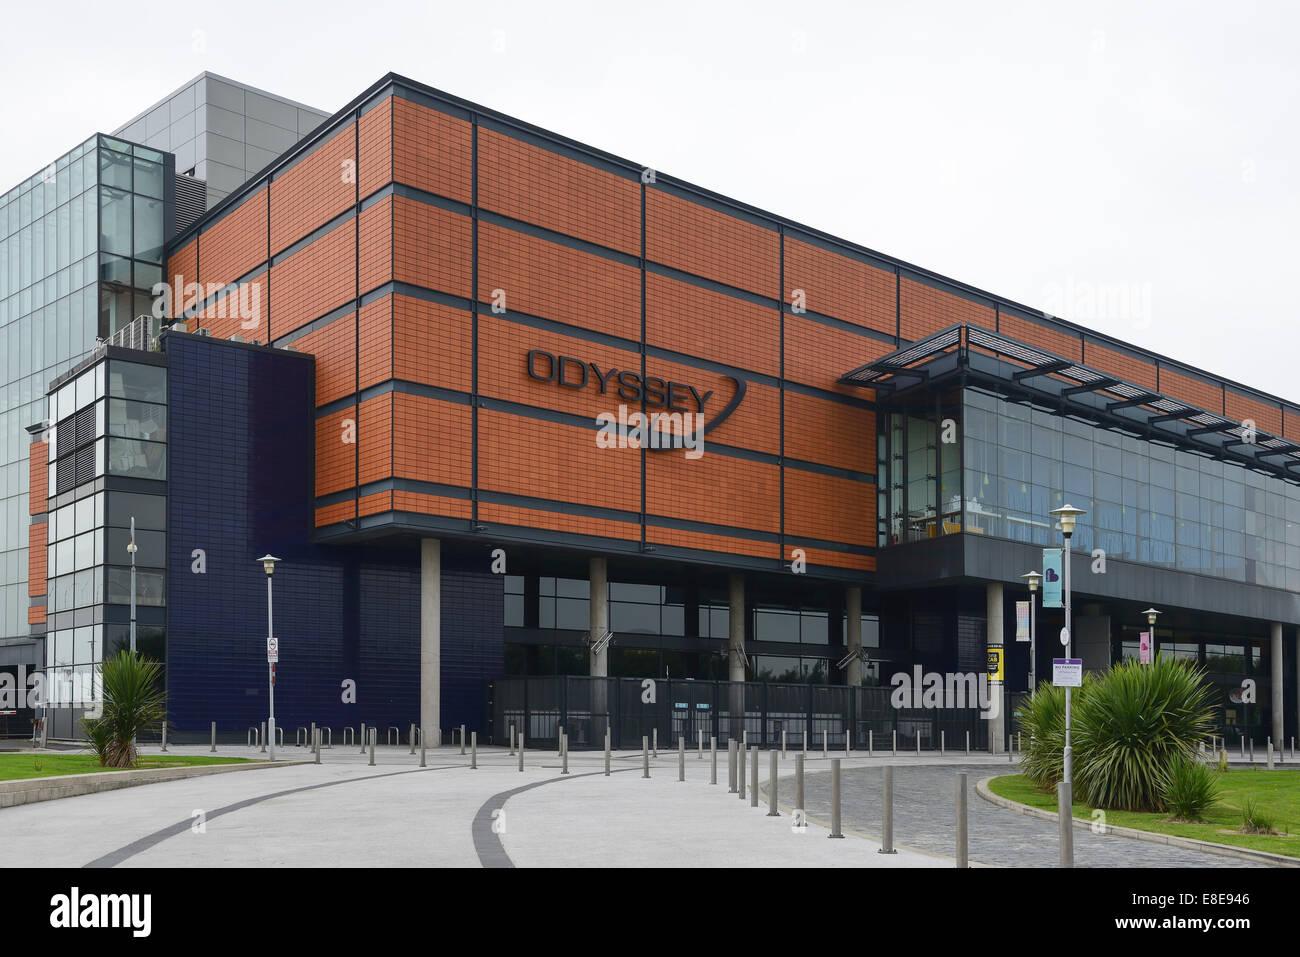 Odyssey Arena entertainment venue Belfast Northern Ireland UK - Stock Image